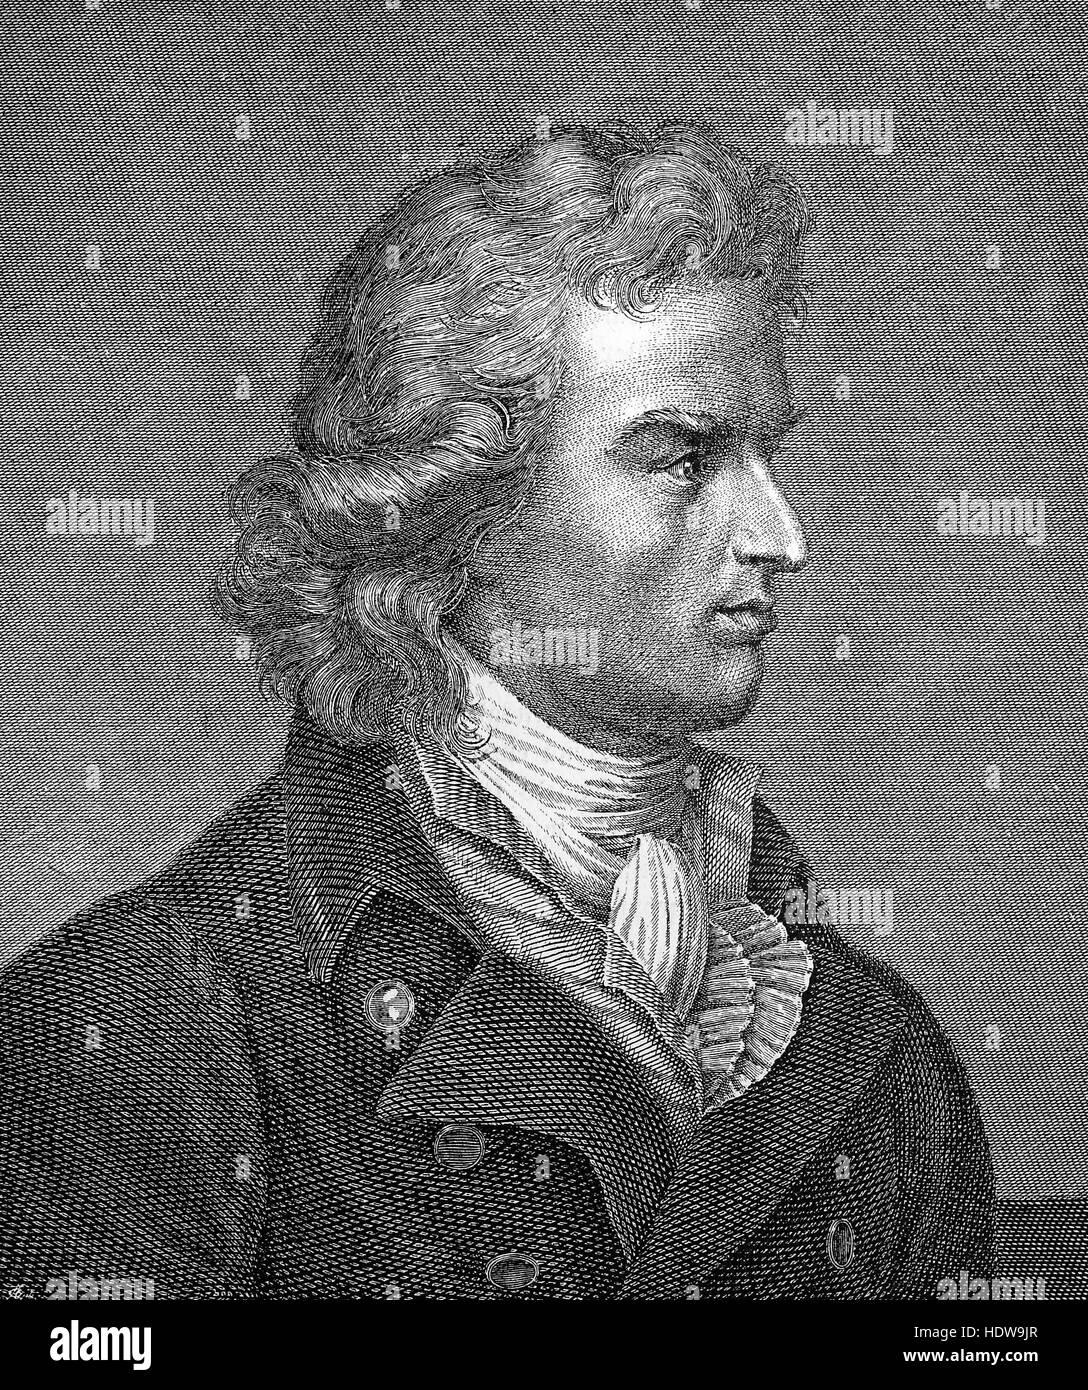 Johann Christoph Friedrich von Schiller, 1759-1805, a German poet, philosopher, physician, historian and playwright, - Stock Image